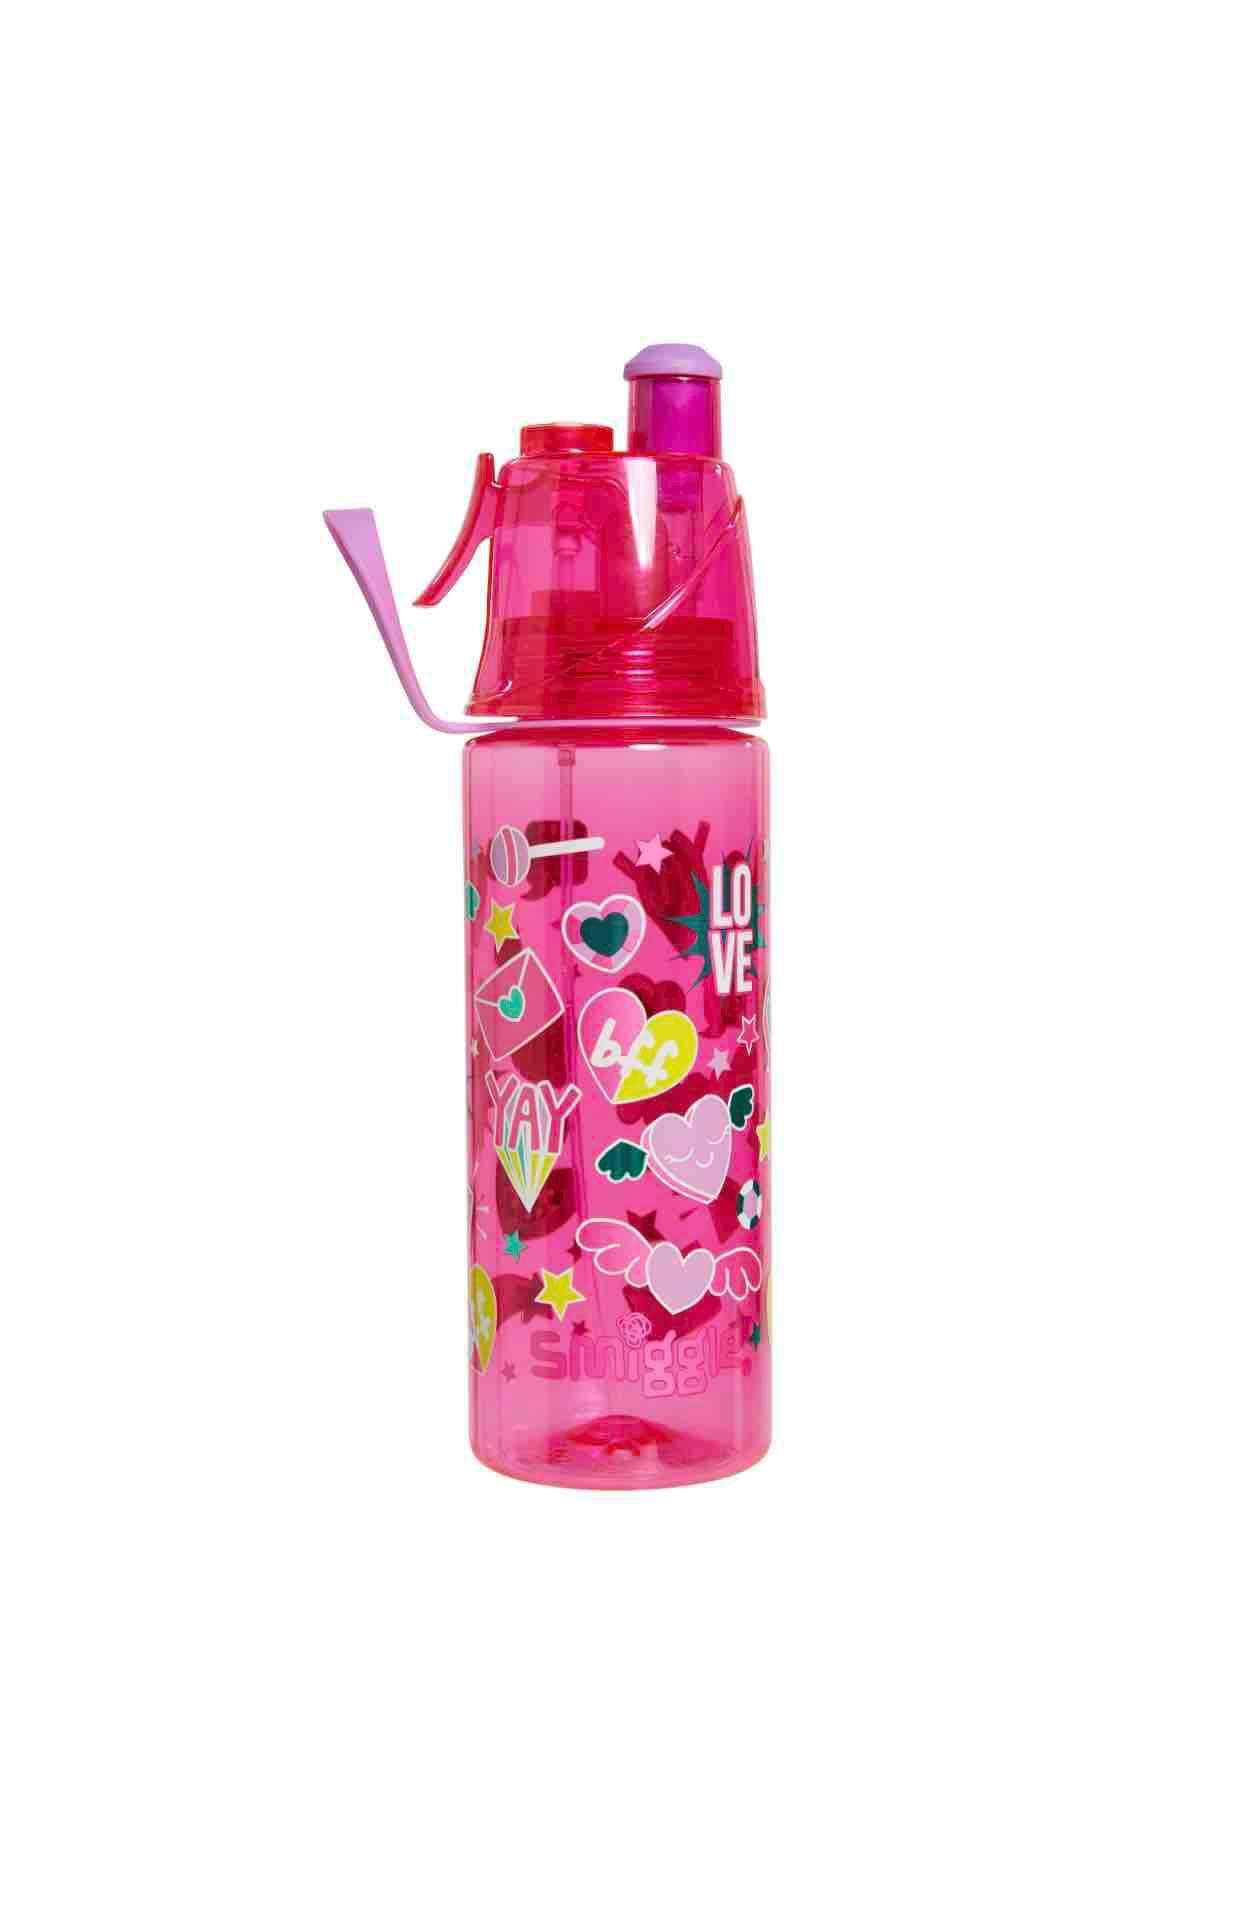 Wham Spritz Water Bottle By Petitp.